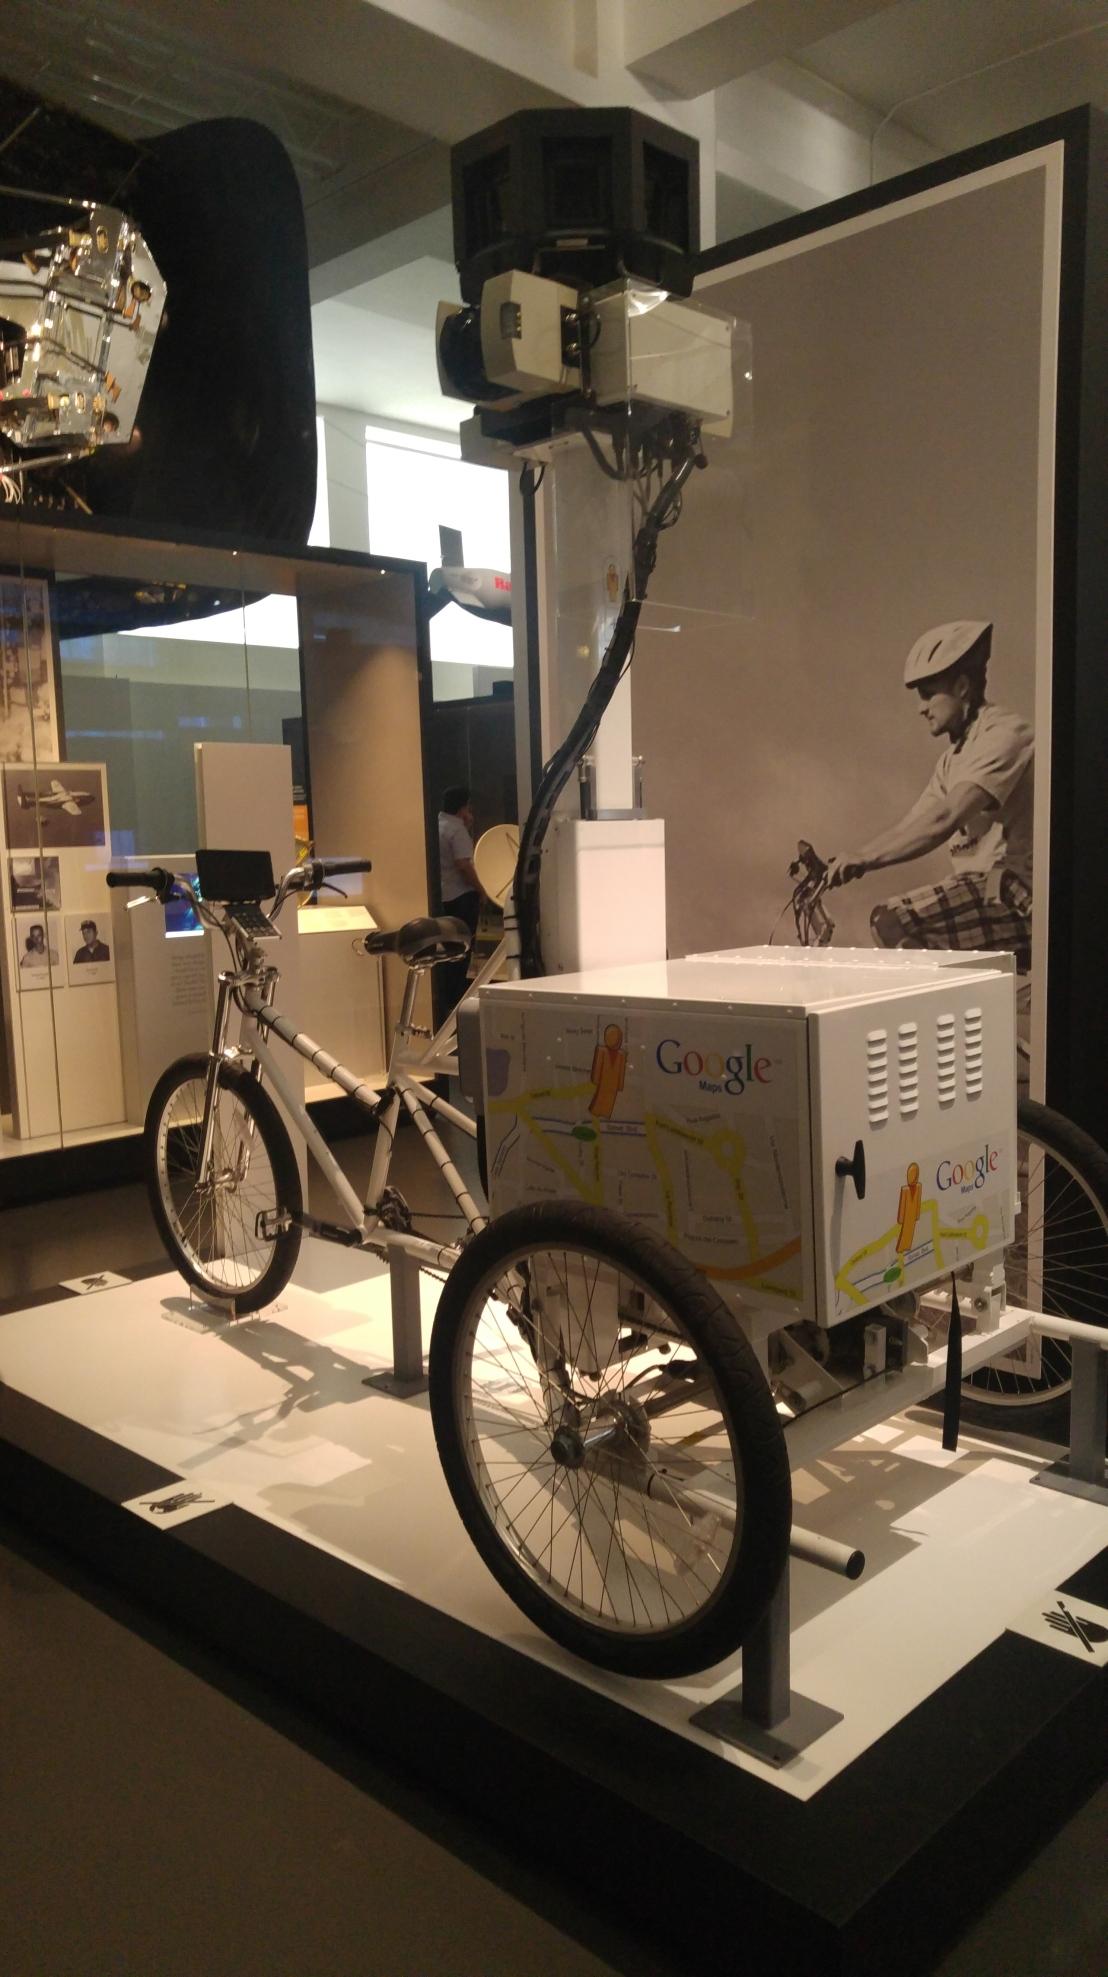 London trip - Science museum - Google bike